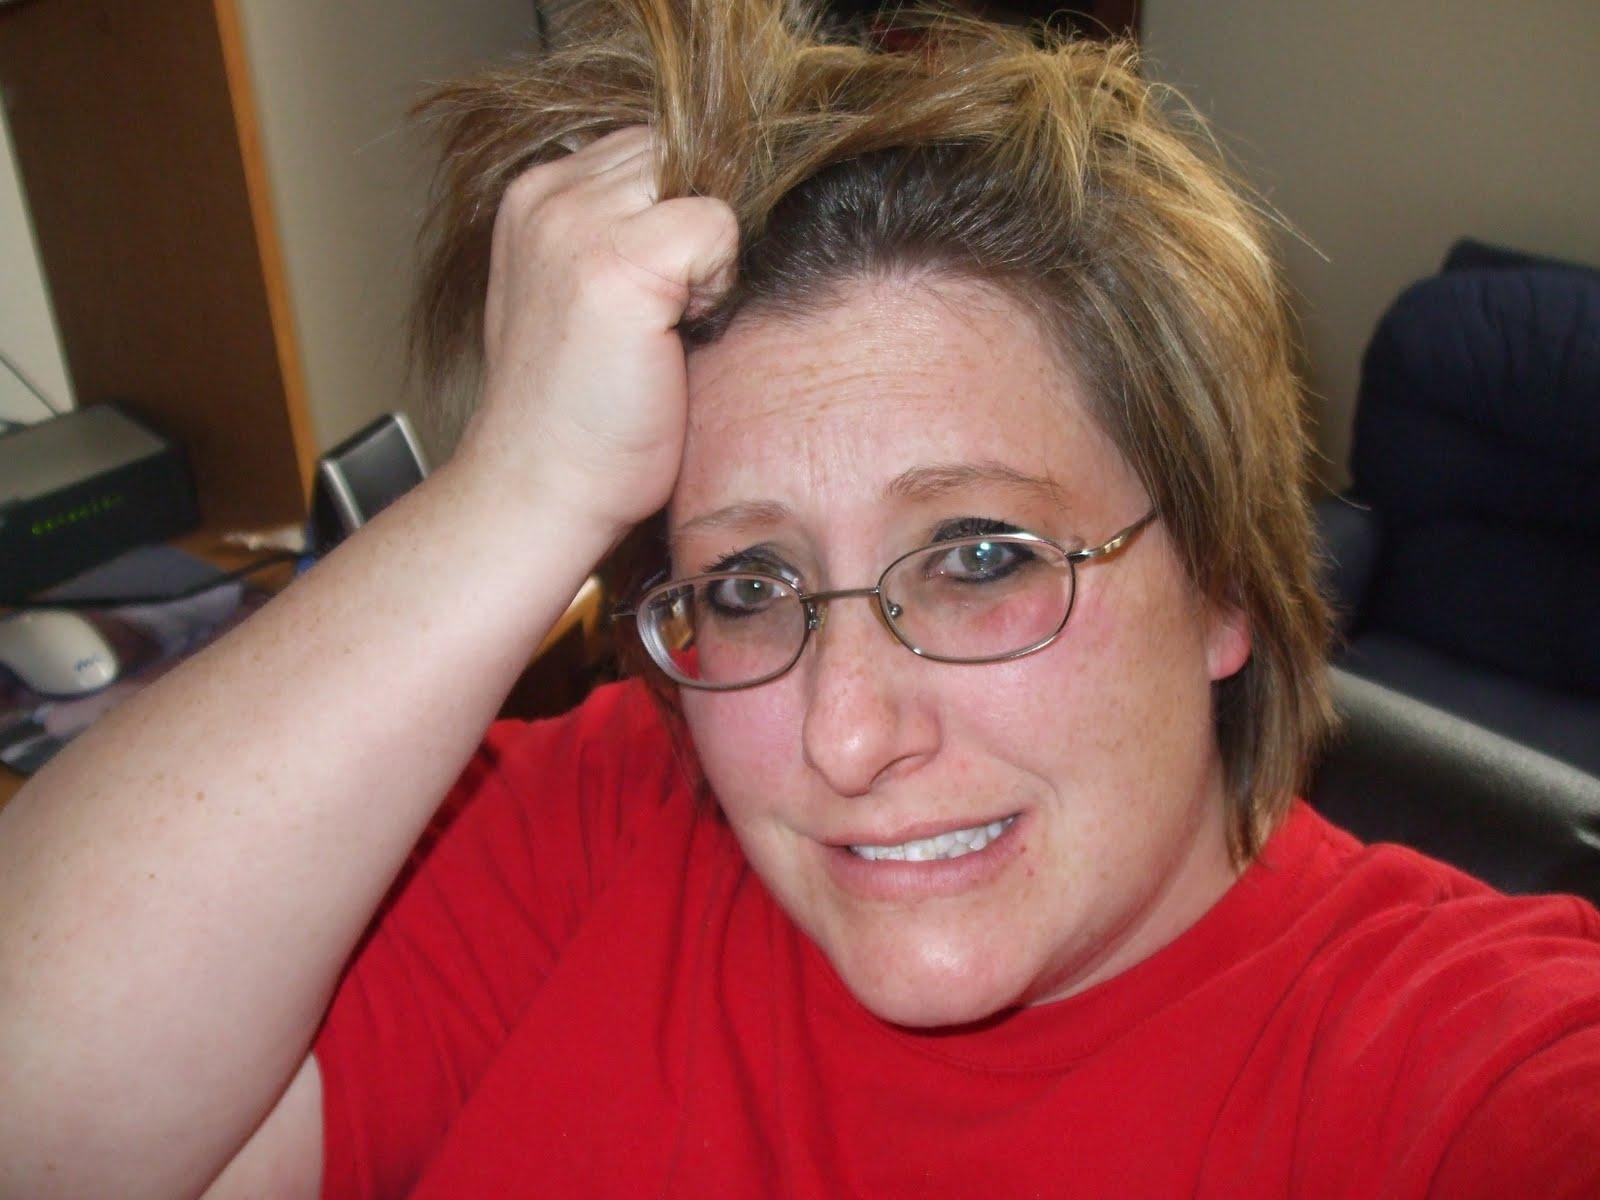 http://3.bp.blogspot.com/_BC3_YECb9Sk/S9SHTkx24_I/AAAAAAAAAxU/0925LYfoXko/s1600/new+hair+cut+065.JPG